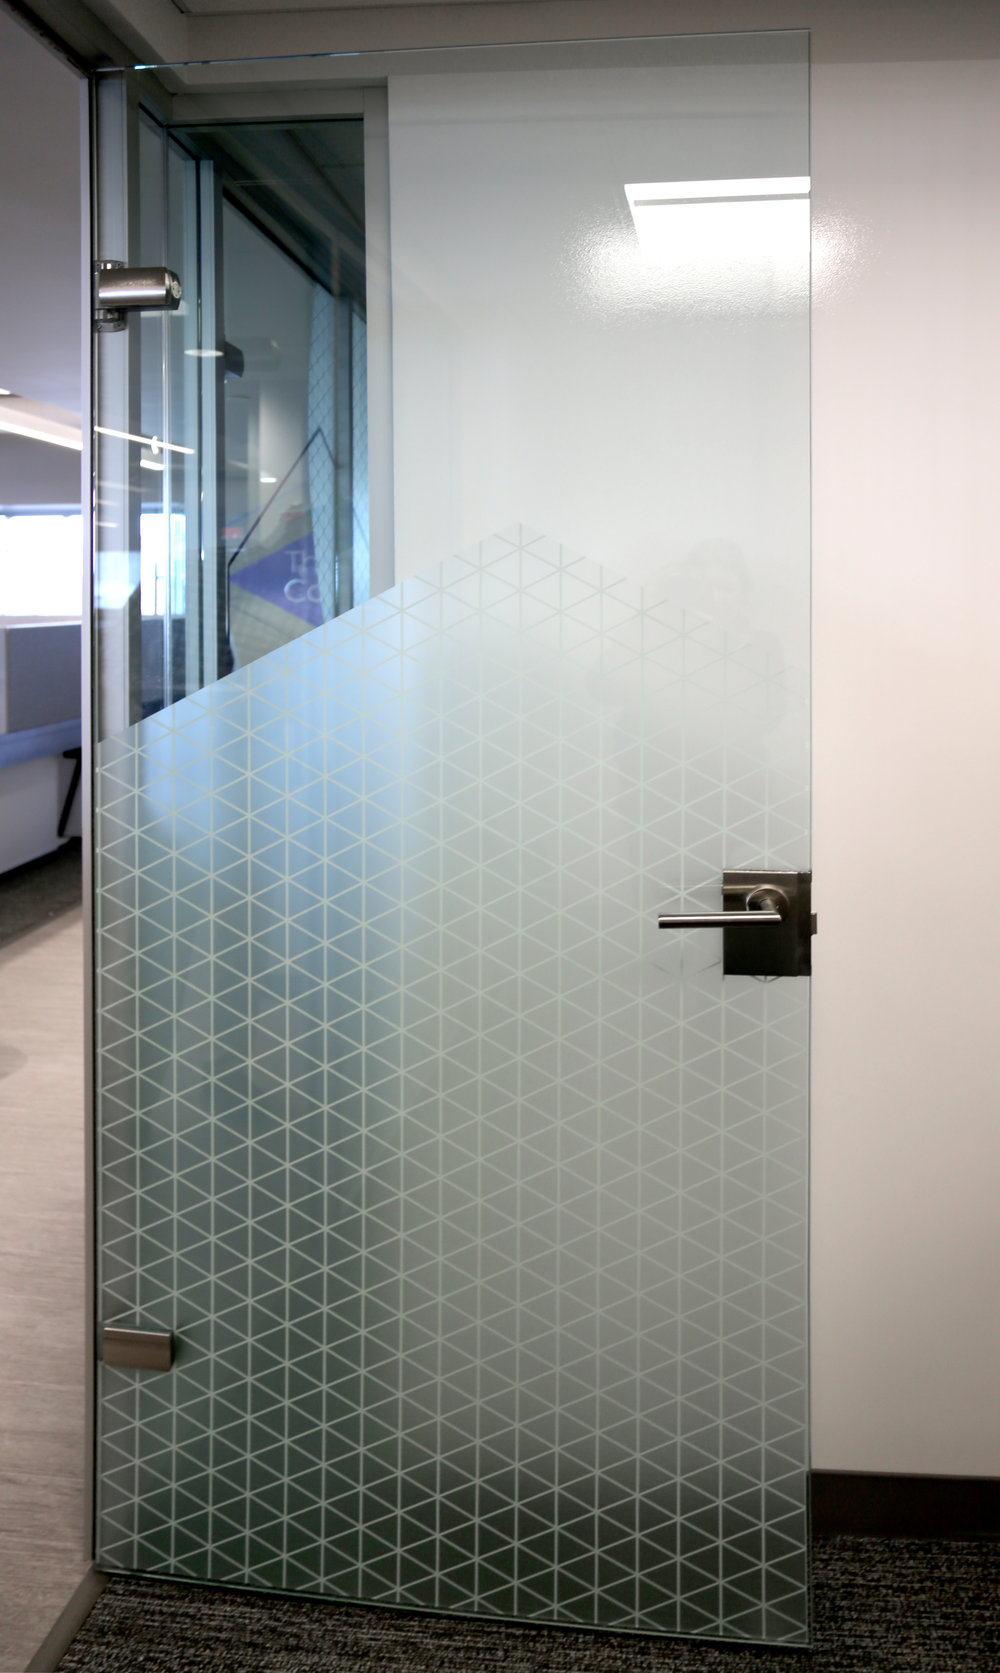 Litespace Frameless Glass Door Glass Mounted Lockset Aluminum Door Frame - Spaceworks AI.jpg